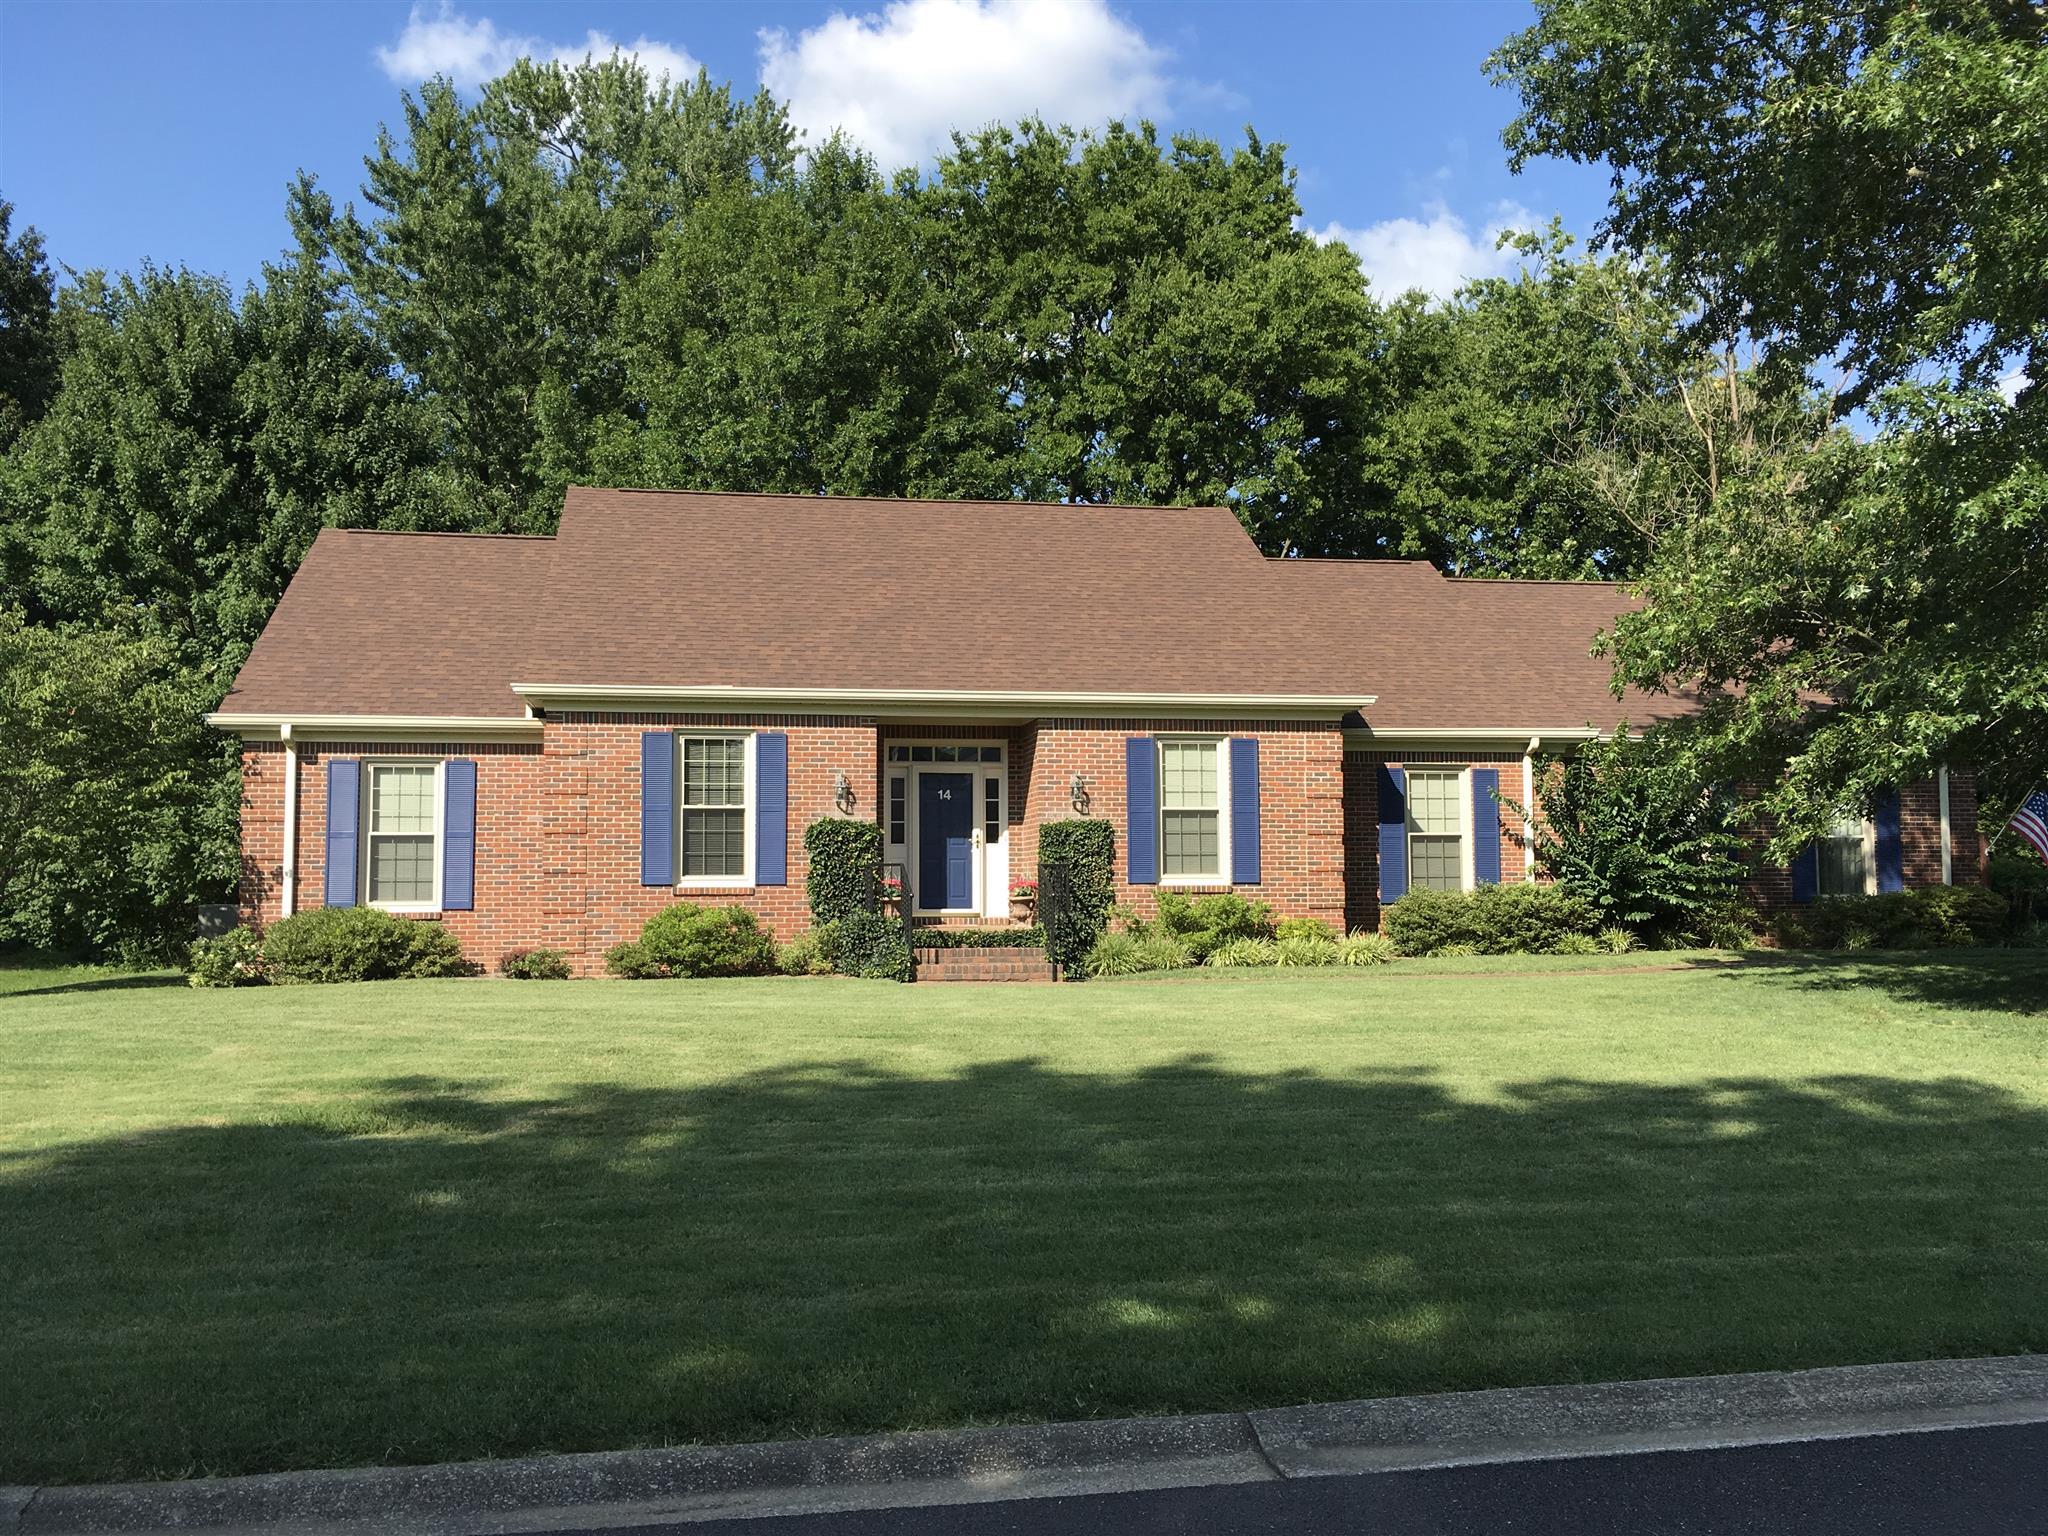 14 Harton Place, Hopkinsville, KY 42240 - Hopkinsville, KY real estate listing